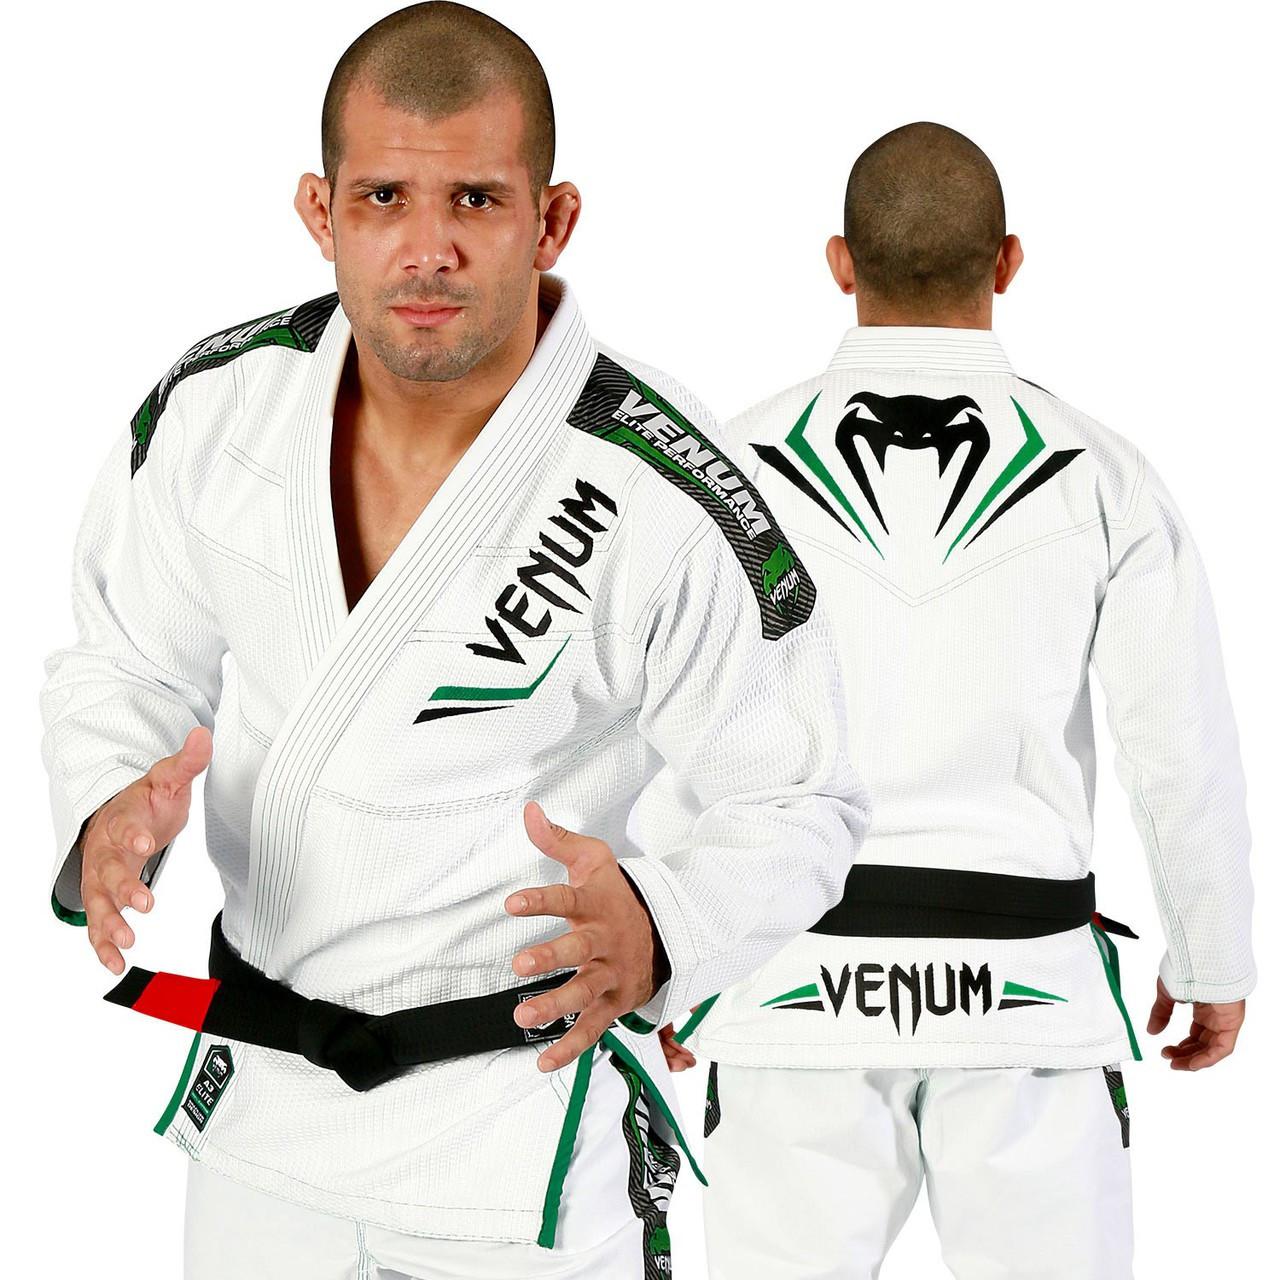 Venum Elite Bjj Gi White Green The Jiu Jitsu Shop